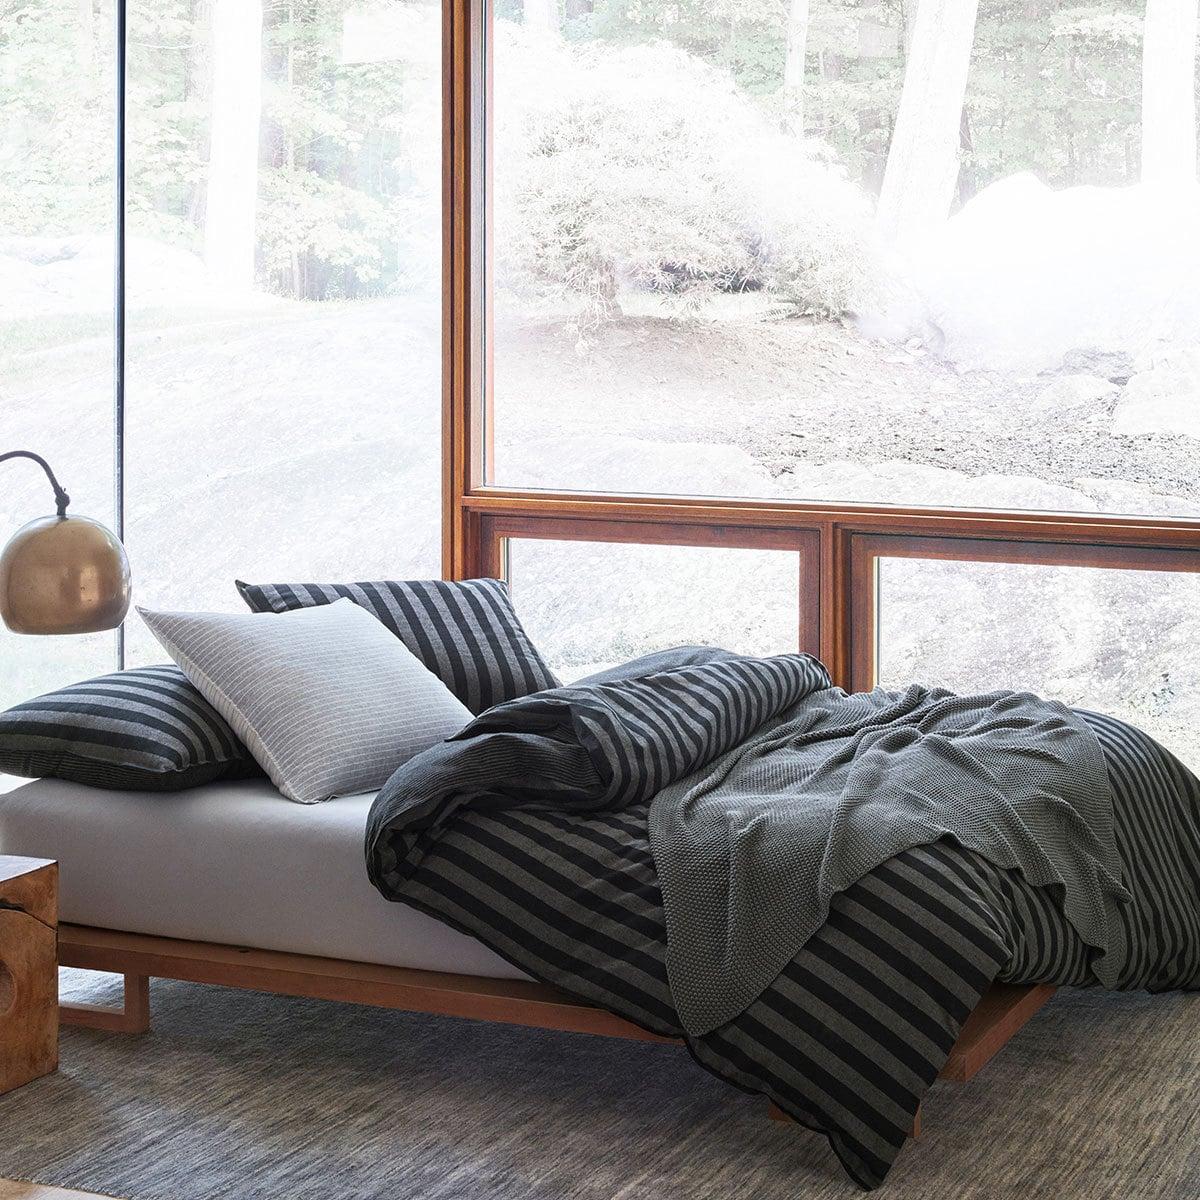 marc o polo flanell bettw sche classic winter stripe g nstig online kaufen bei bettwaren shop. Black Bedroom Furniture Sets. Home Design Ideas